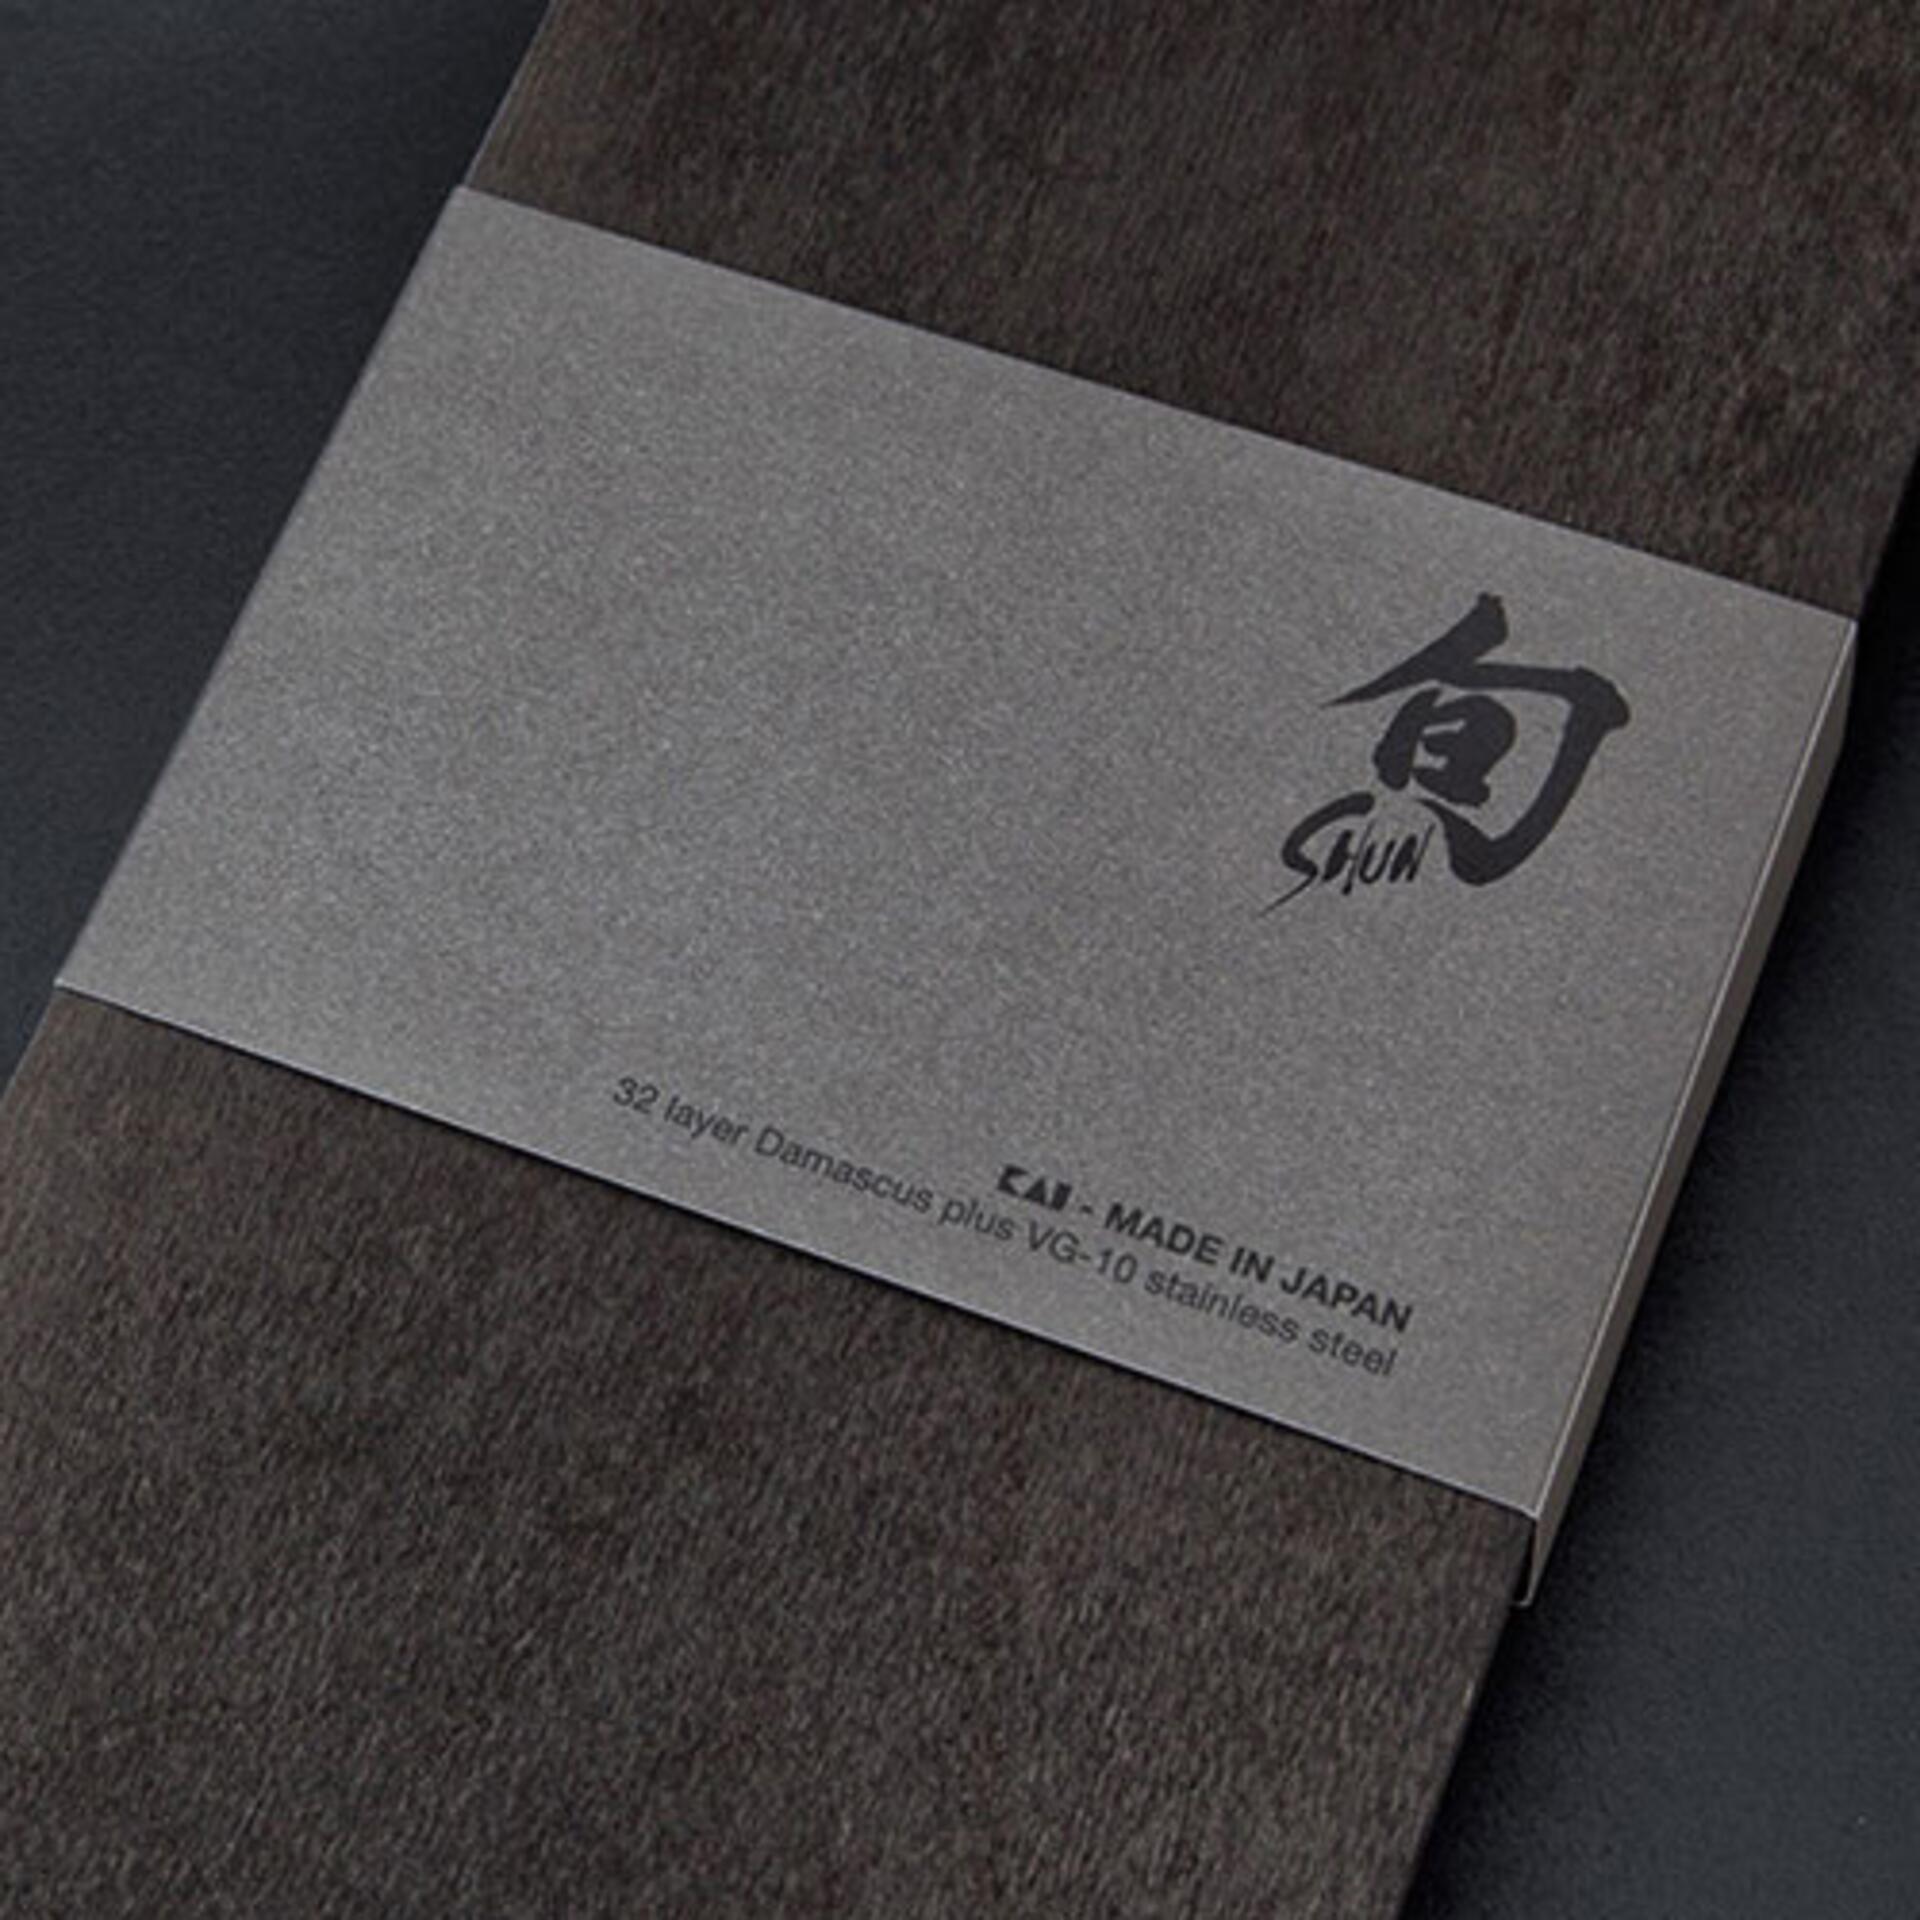 KAI Shun Classic Brotmesser DM-0705